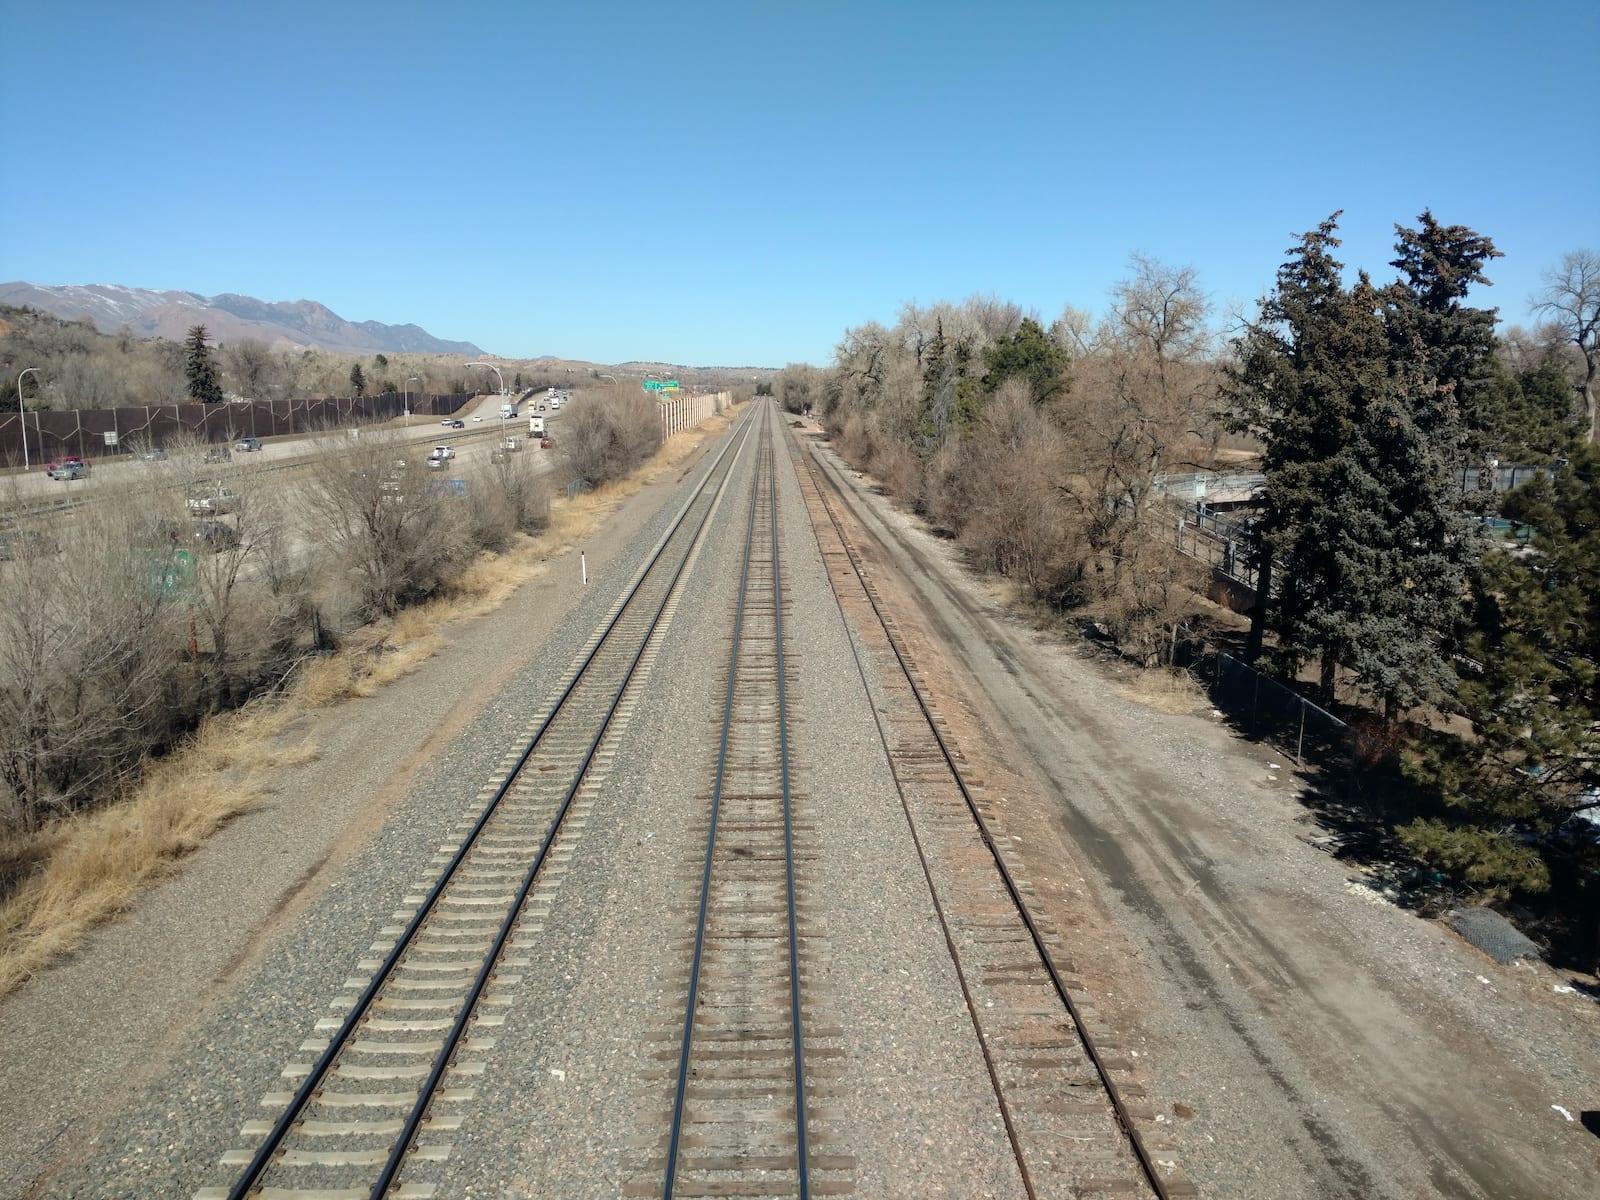 Train Railroad Tracks Between Colorado Springs and Denver